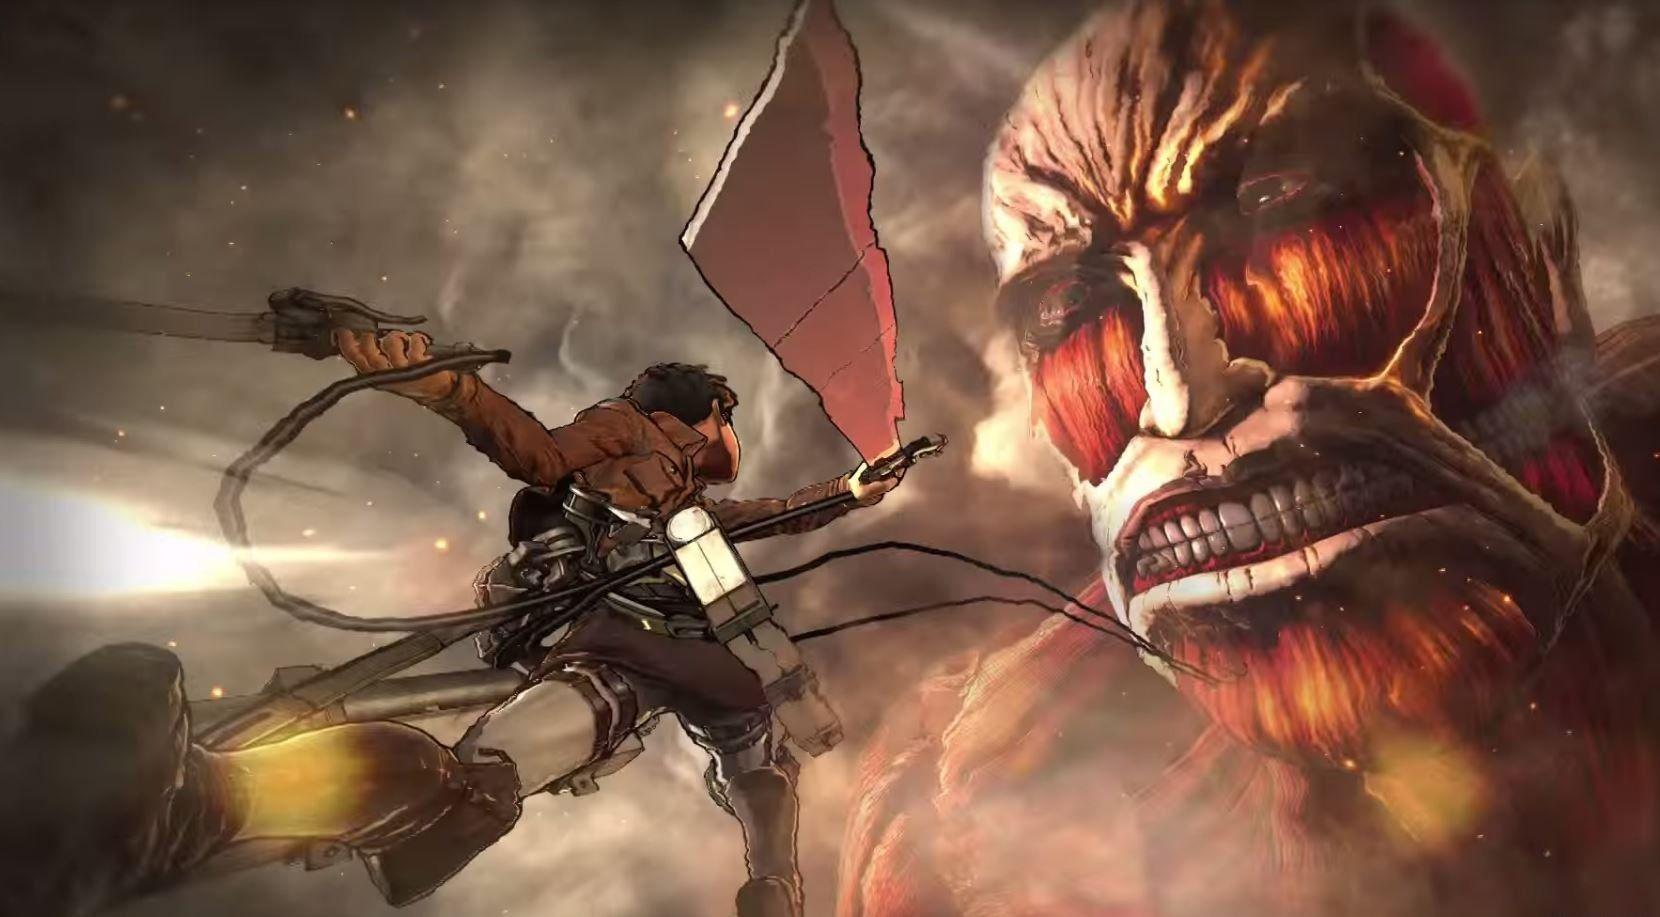 1660x917 Attack on Titan Season 4: The Concluding Season!